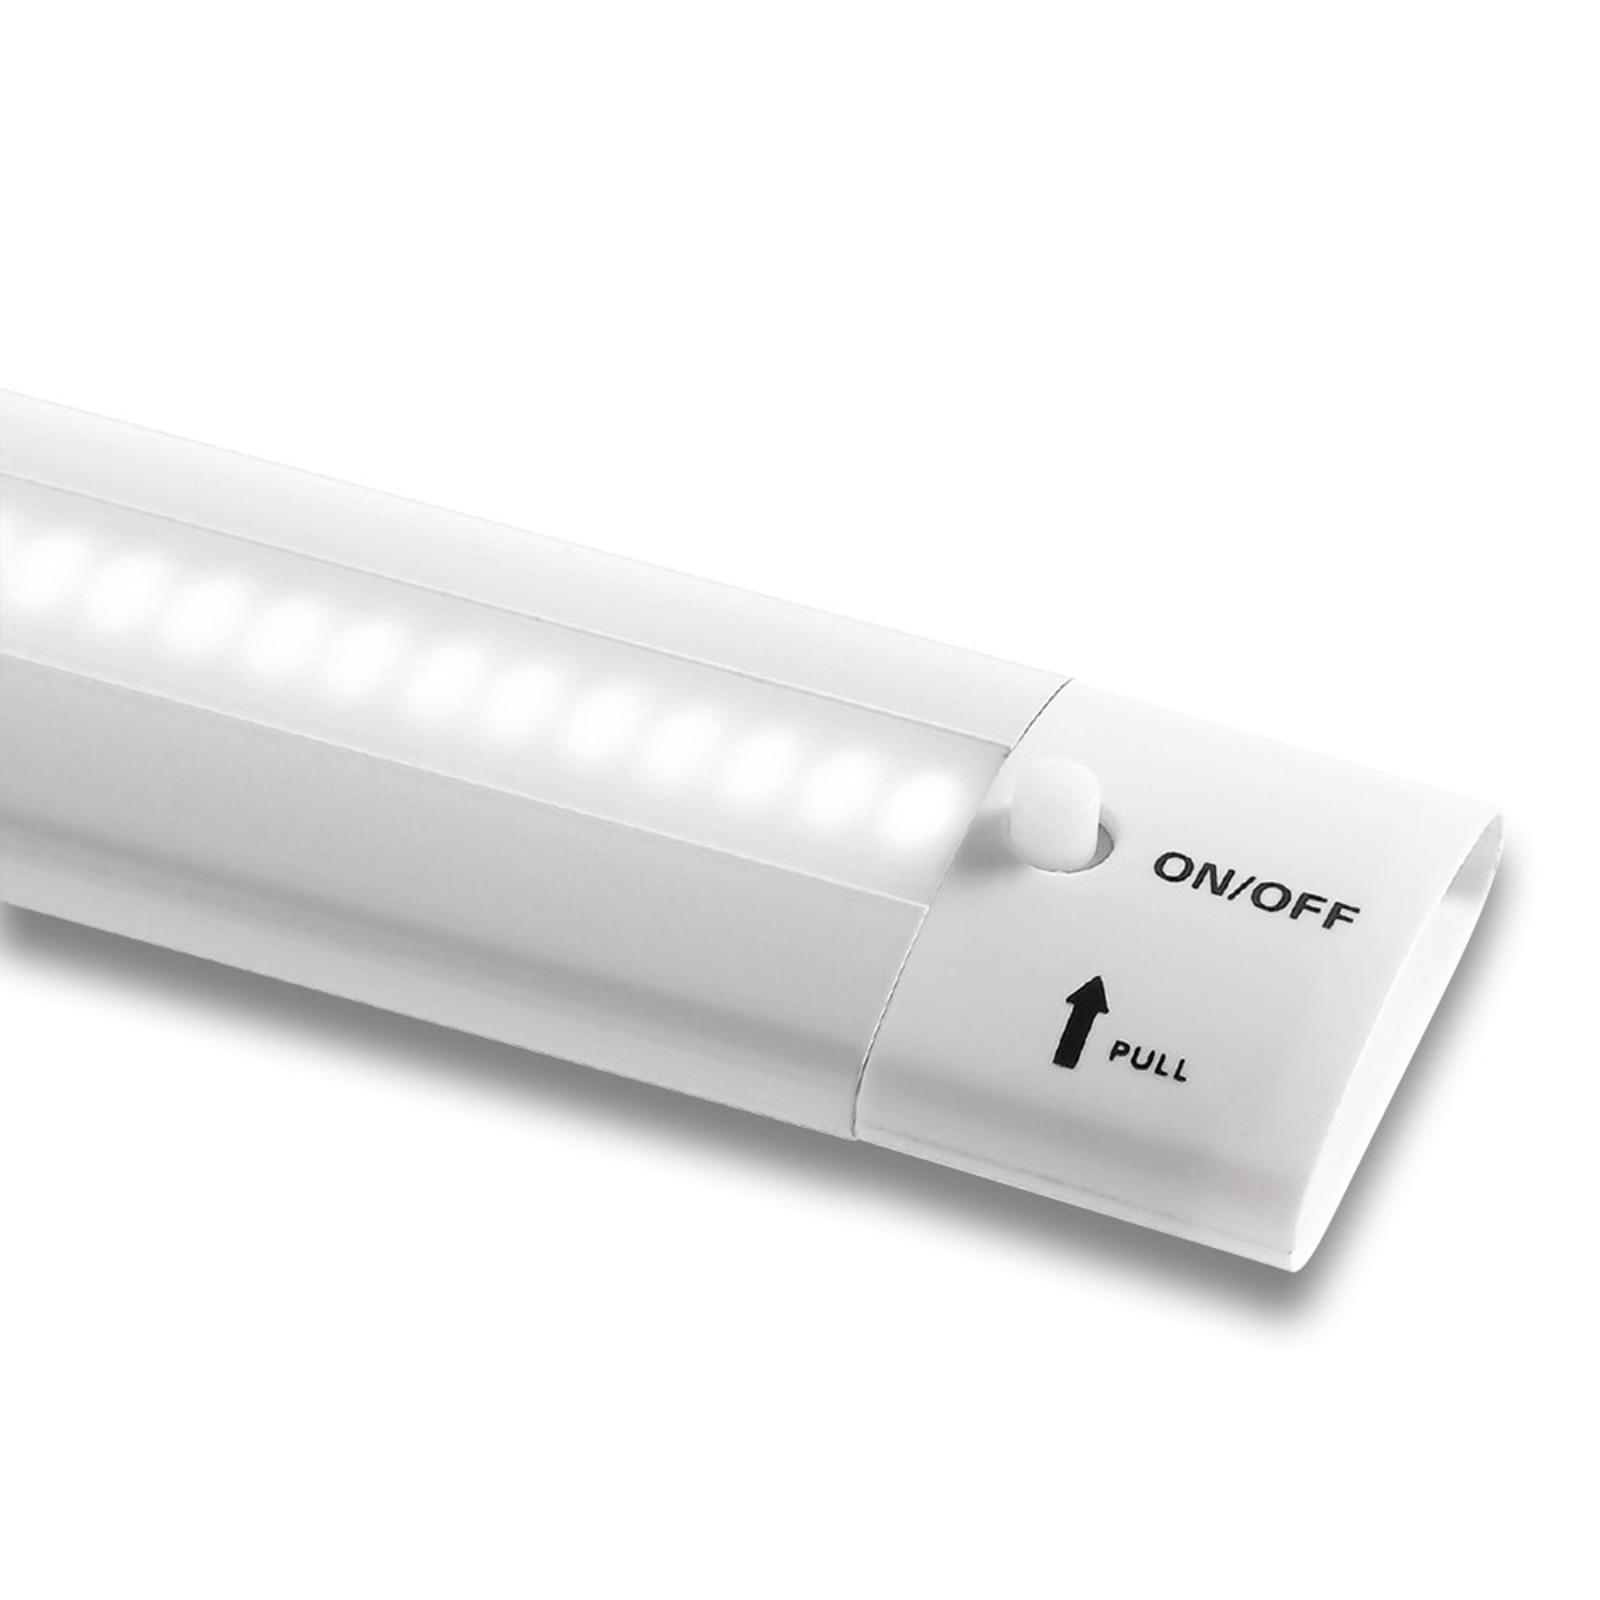 Applique sous meuble LED Galway 6690, blanc